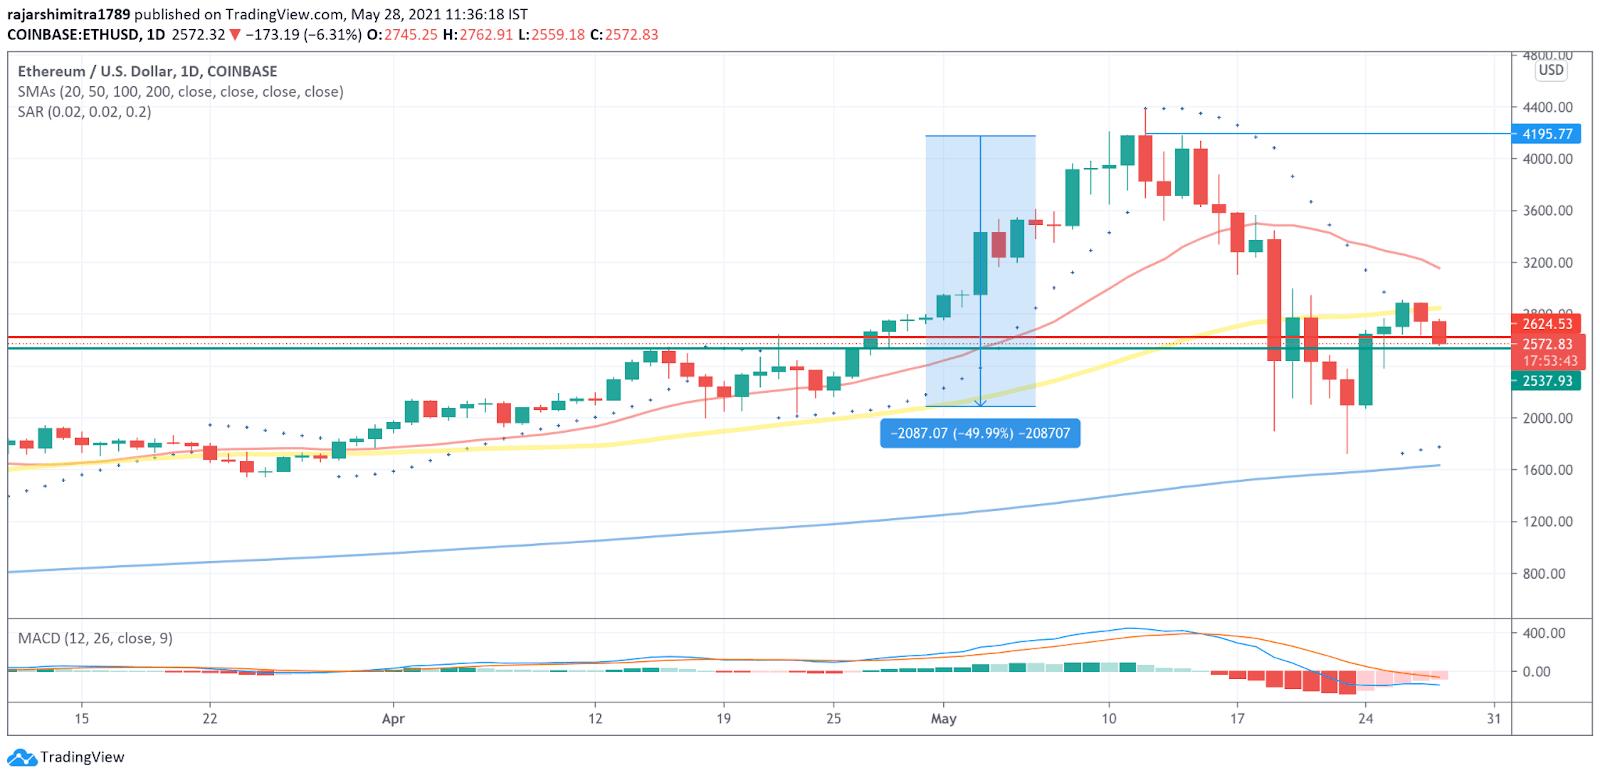 ETH/USD daily chart 052821